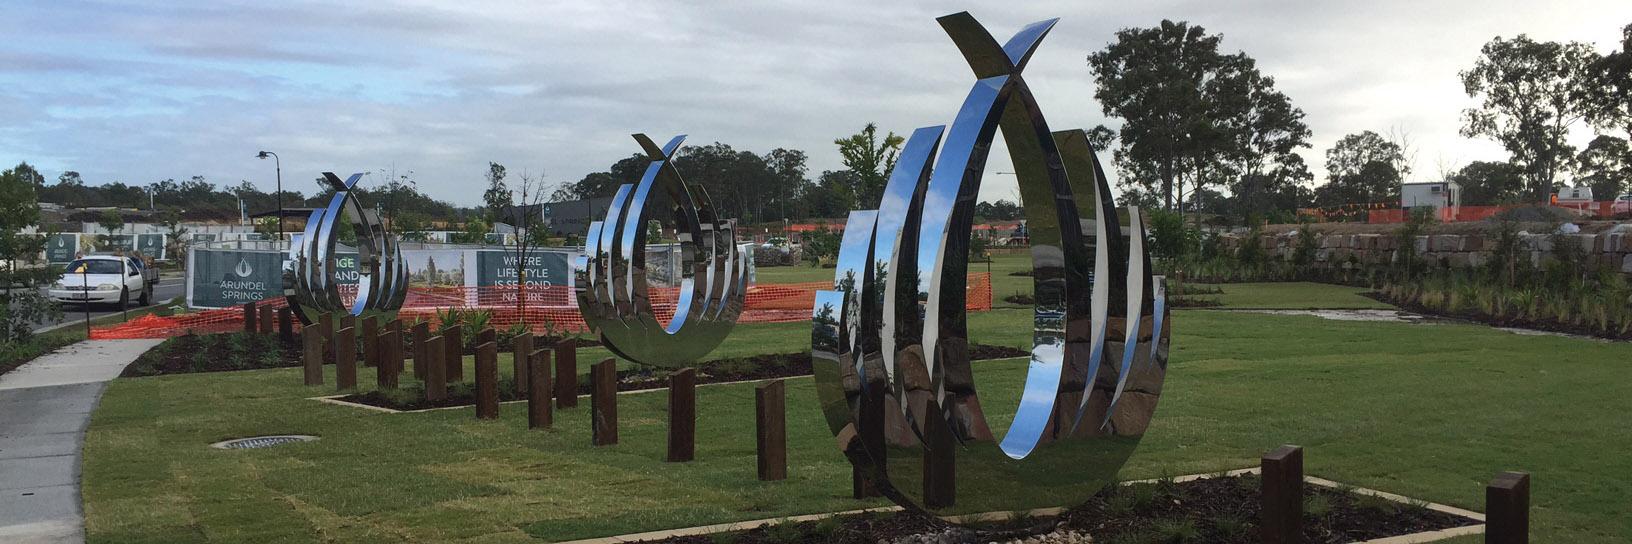 Art Symbolises Community